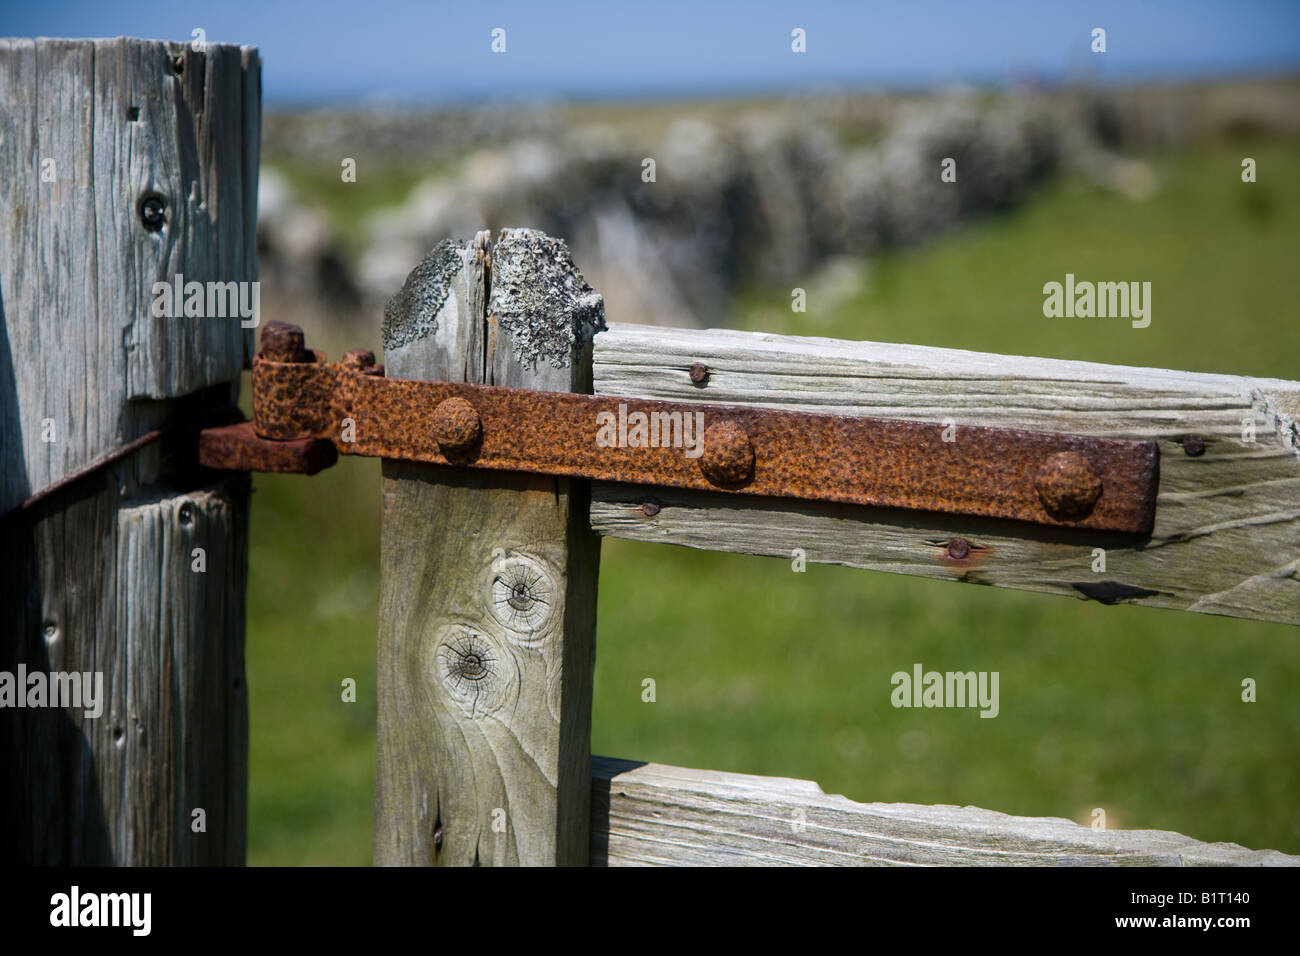 tor scharnier stockfotos & tor scharnier bilder - alamy